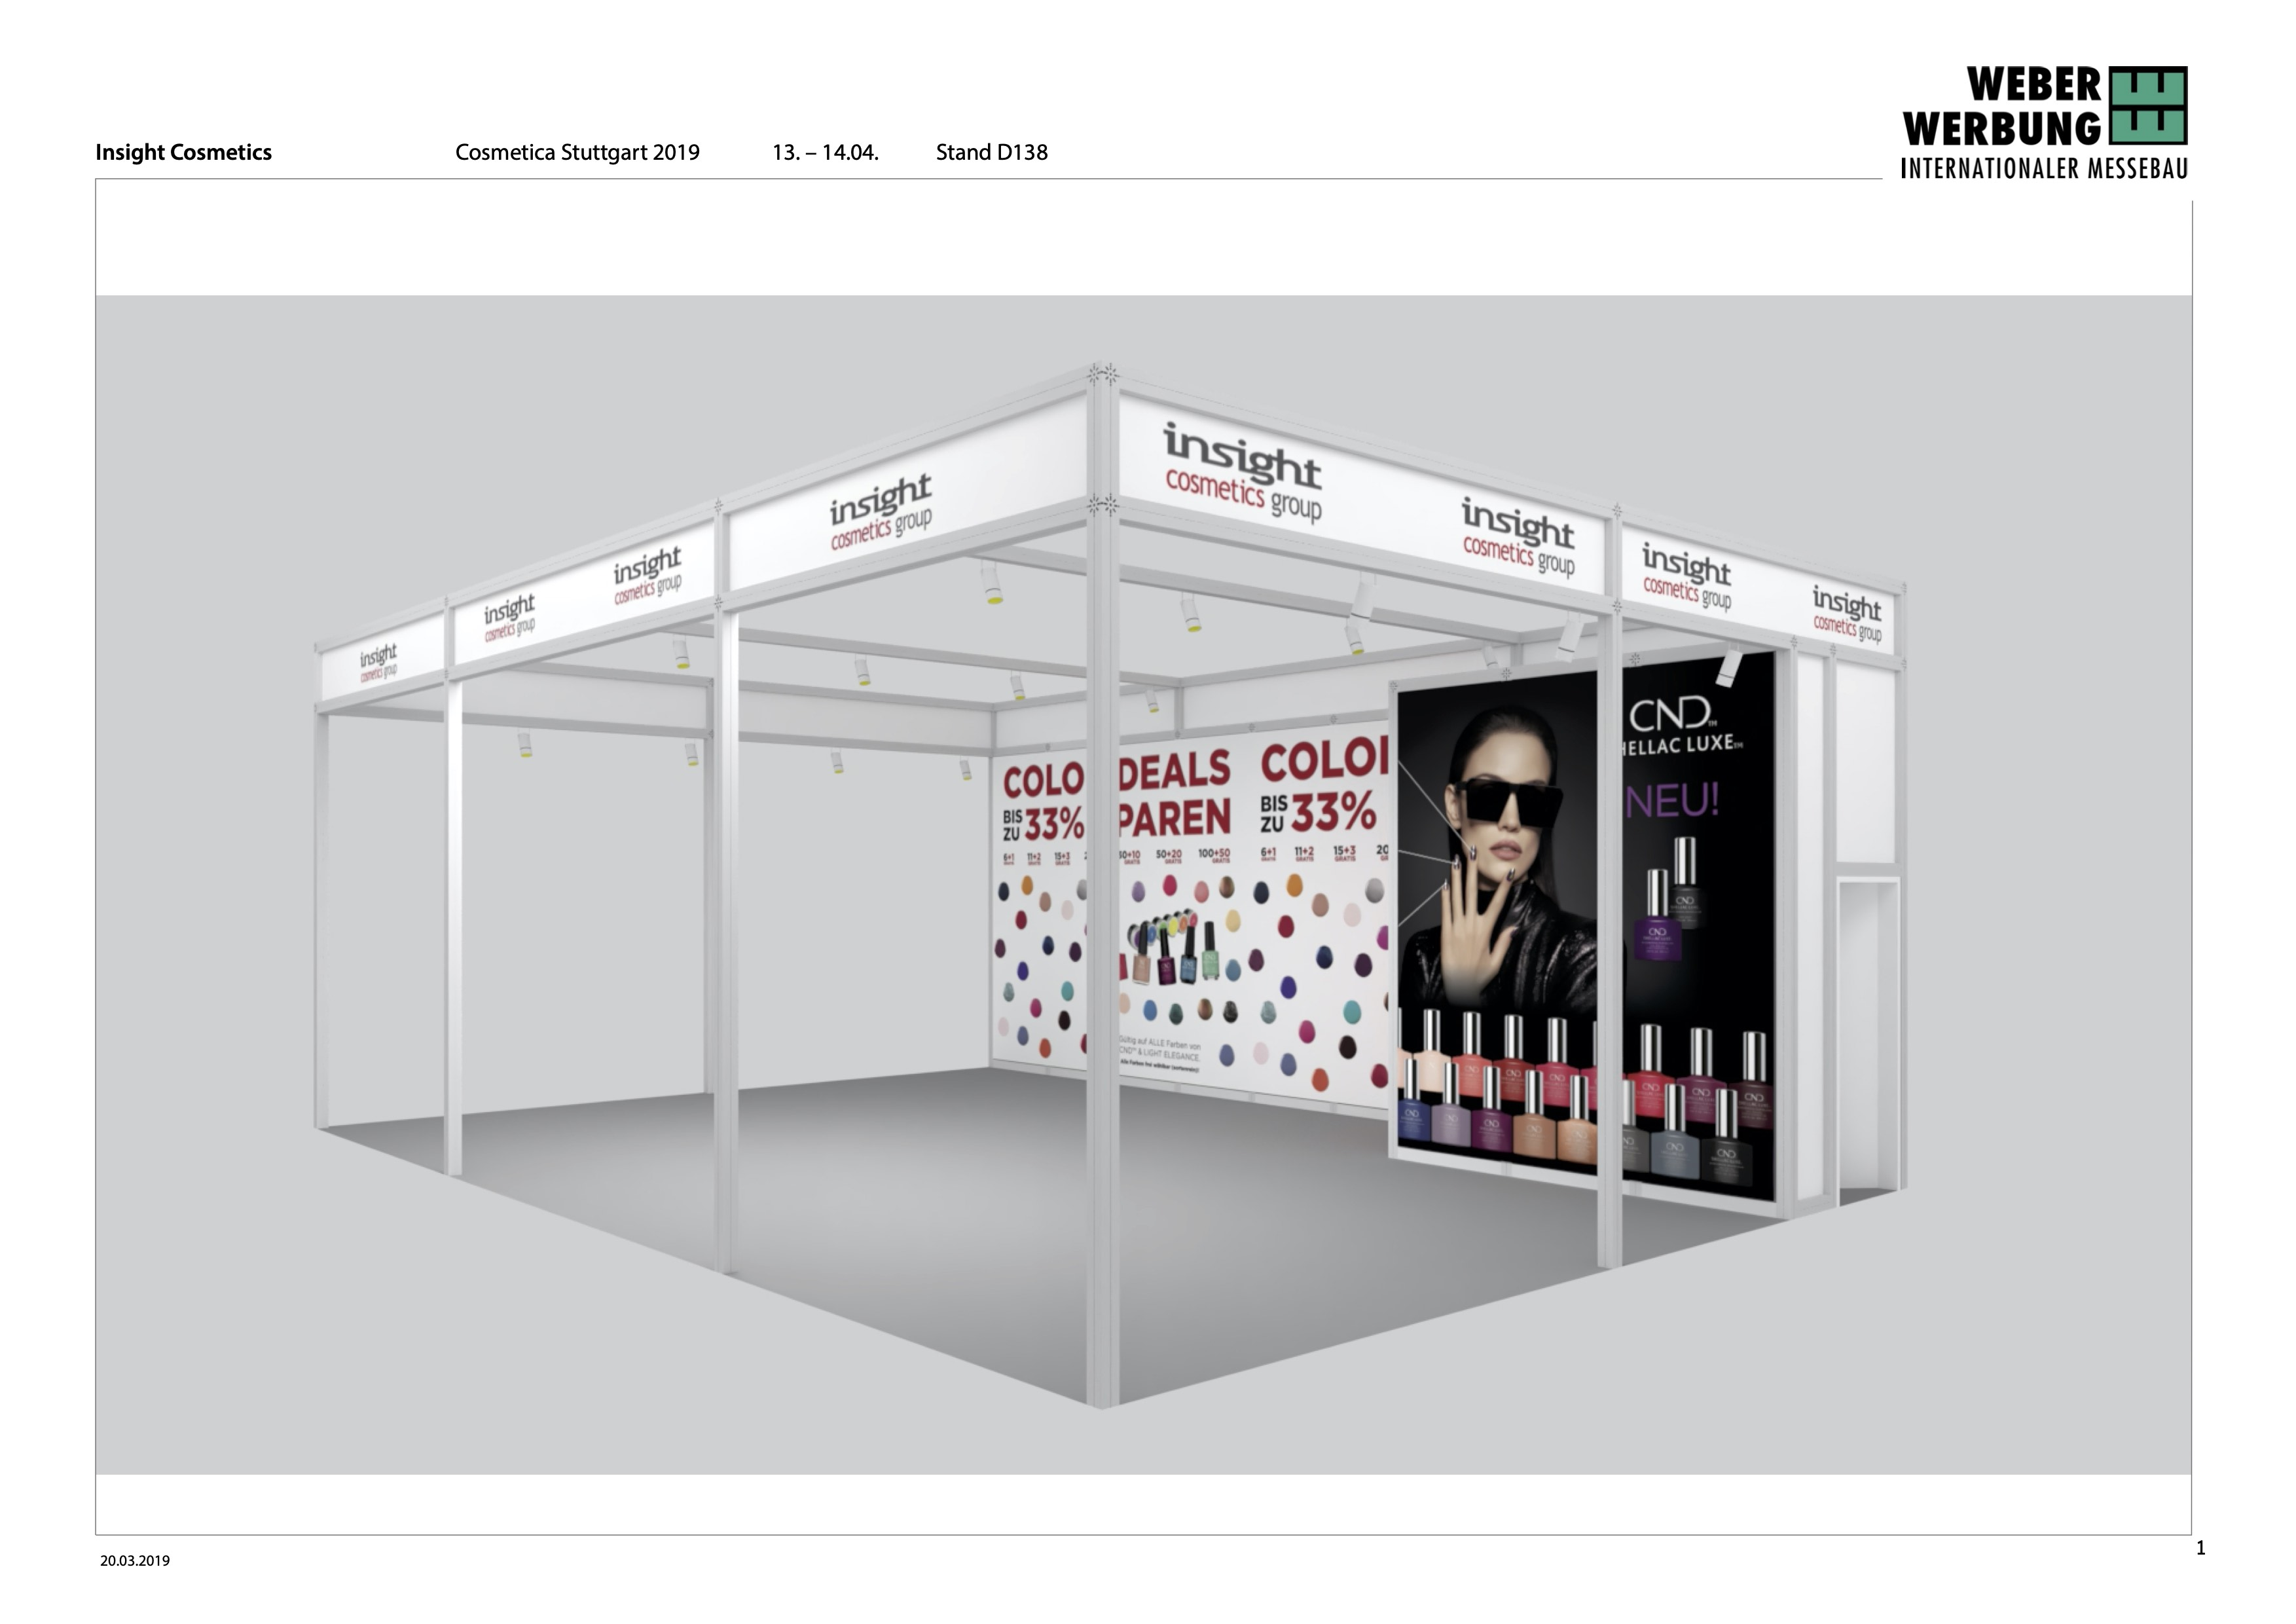 Entwurf Insight Cosmetics Cosmetica Stuttgart